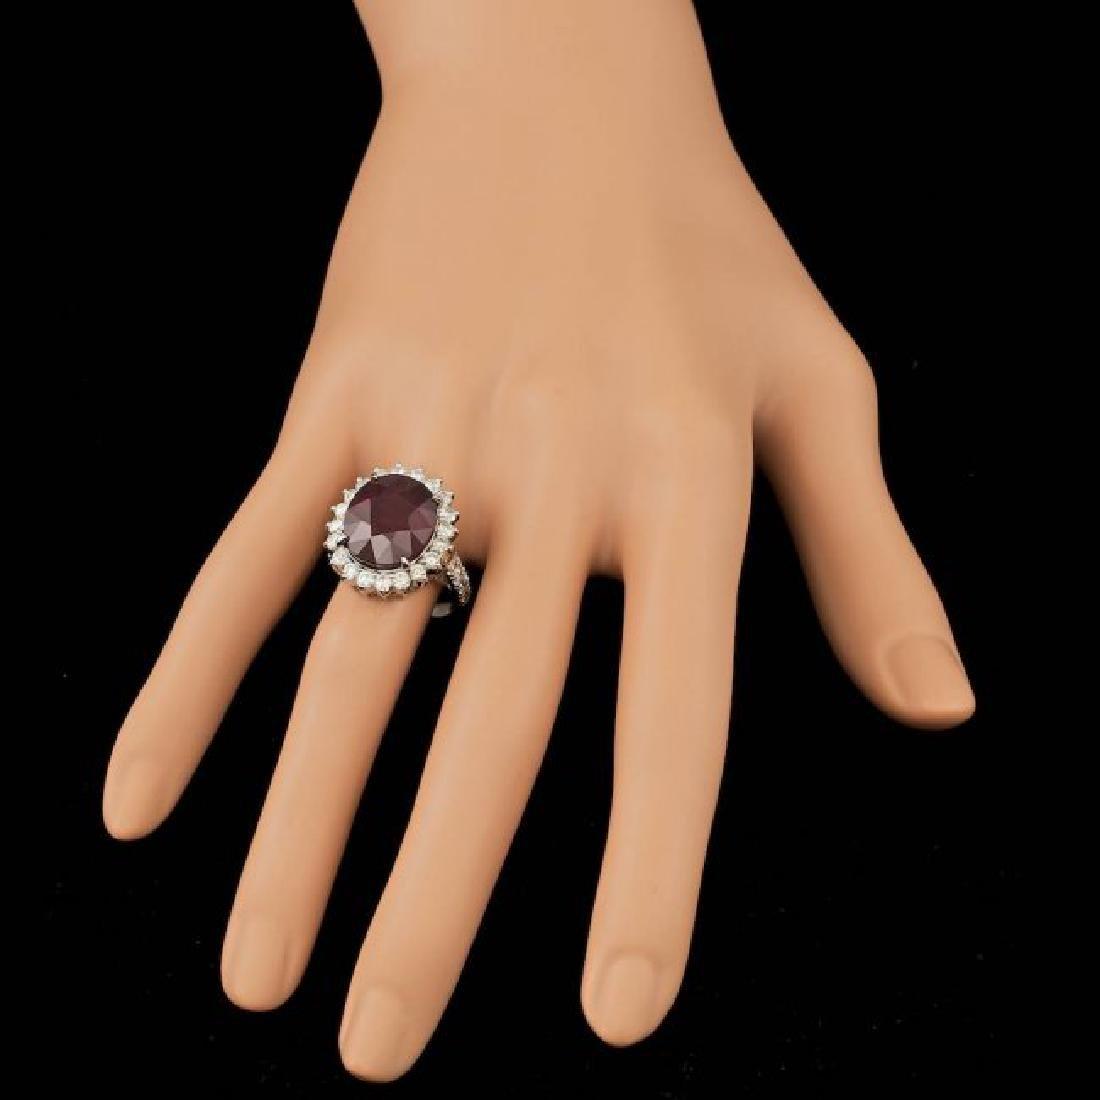 14k White Gold 12.50ct Ruby 1.50ct Diamond Ring - 4